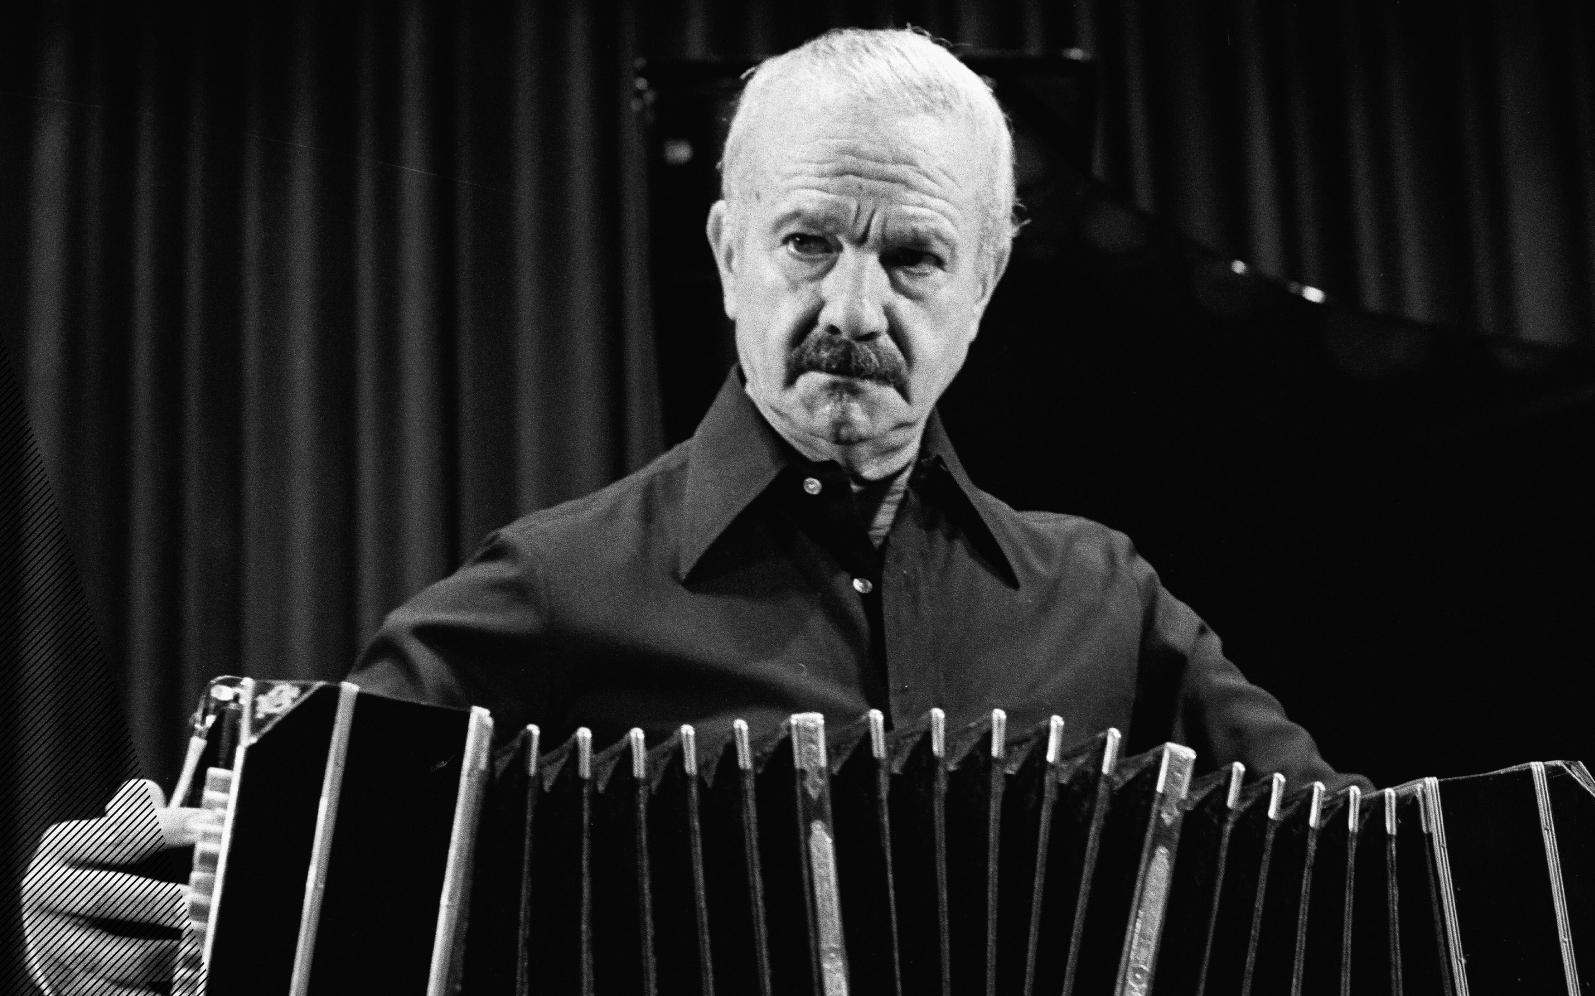 Compositor e bandoneonista argentino Astor Piazzolla, que revolucionou o tango tradicional.